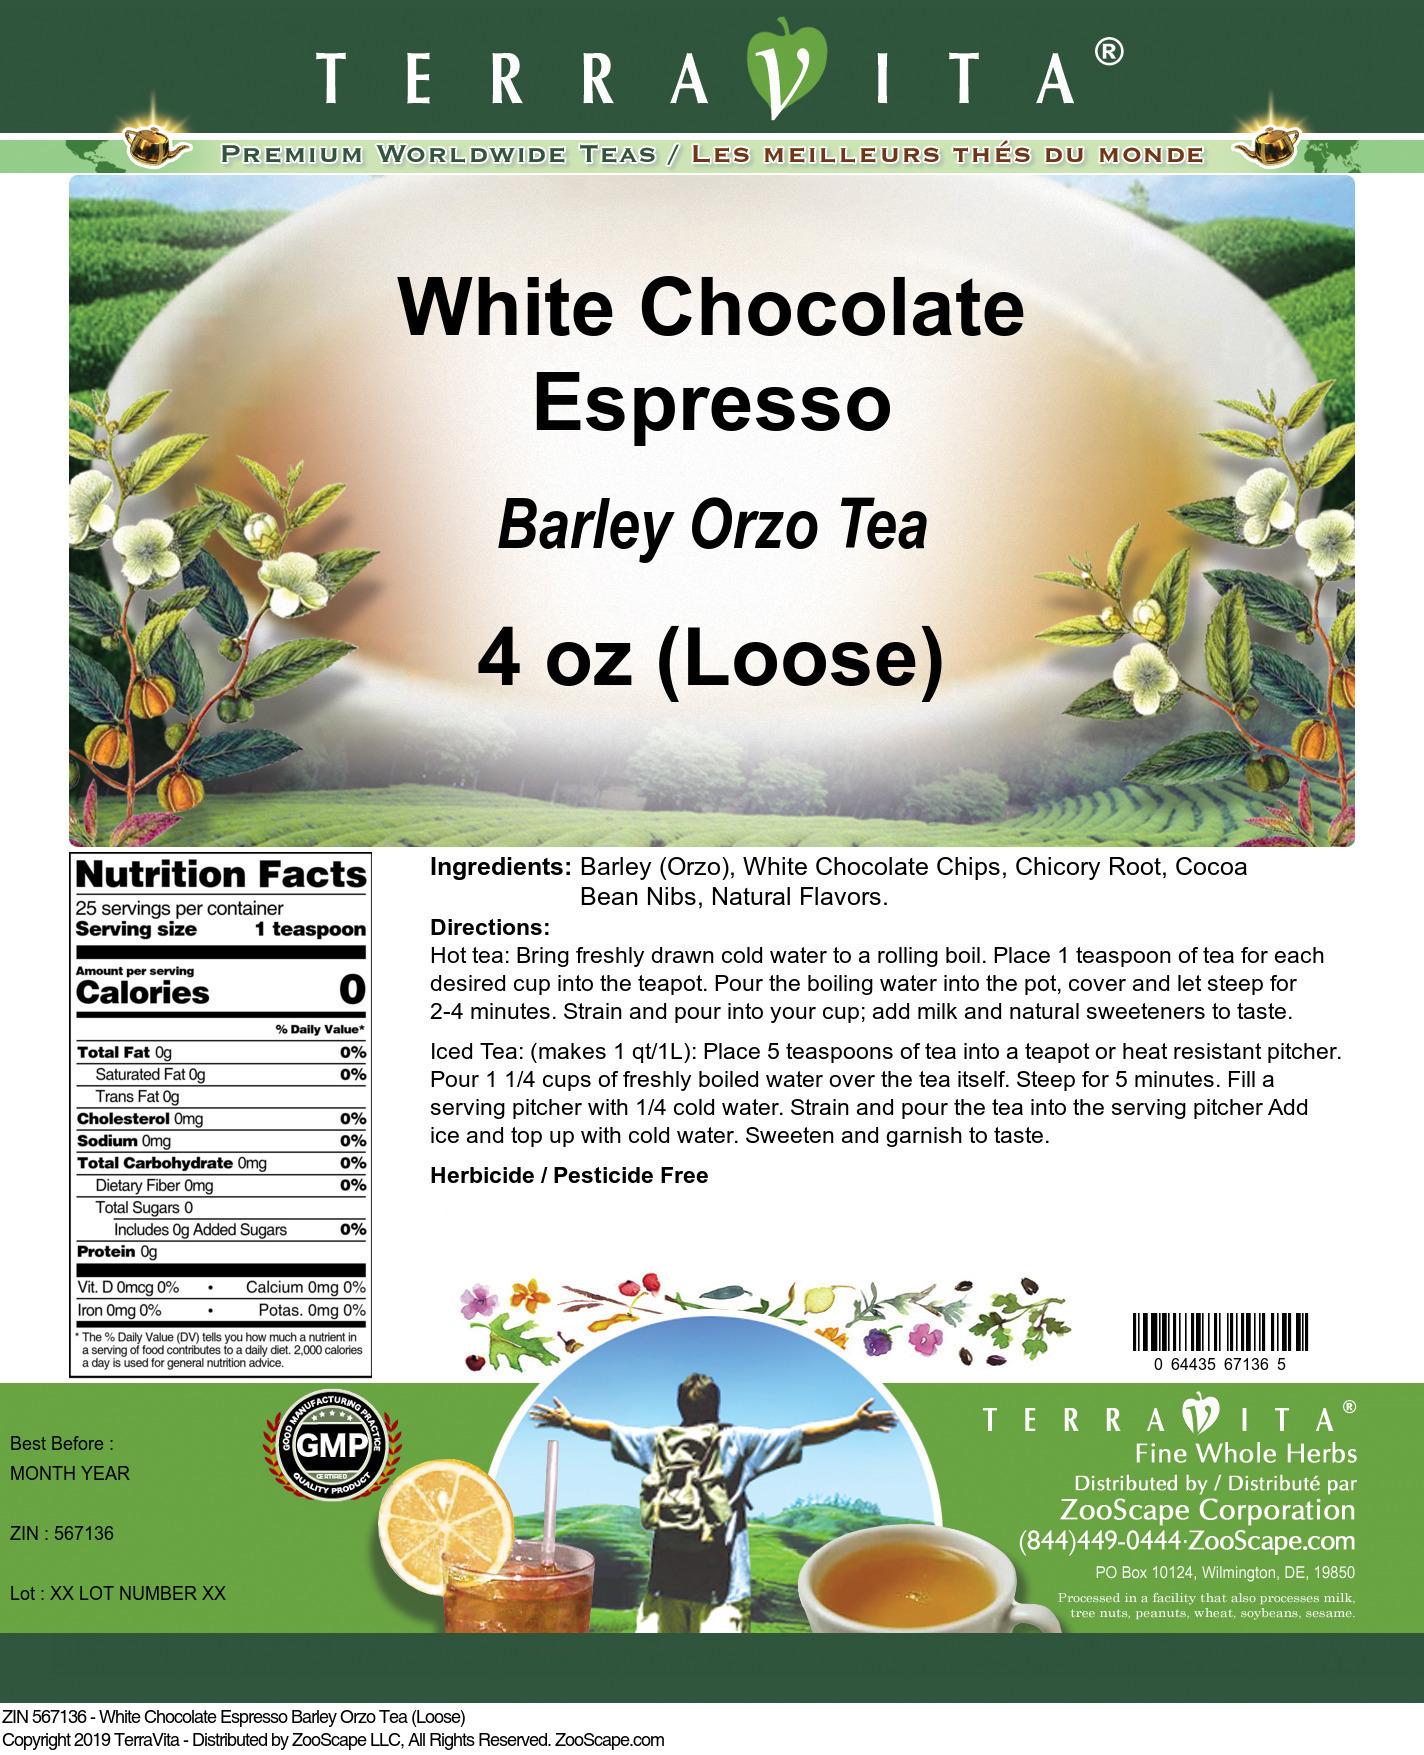 White Chocolate Espresso Barley Orzo Tea (Loose)